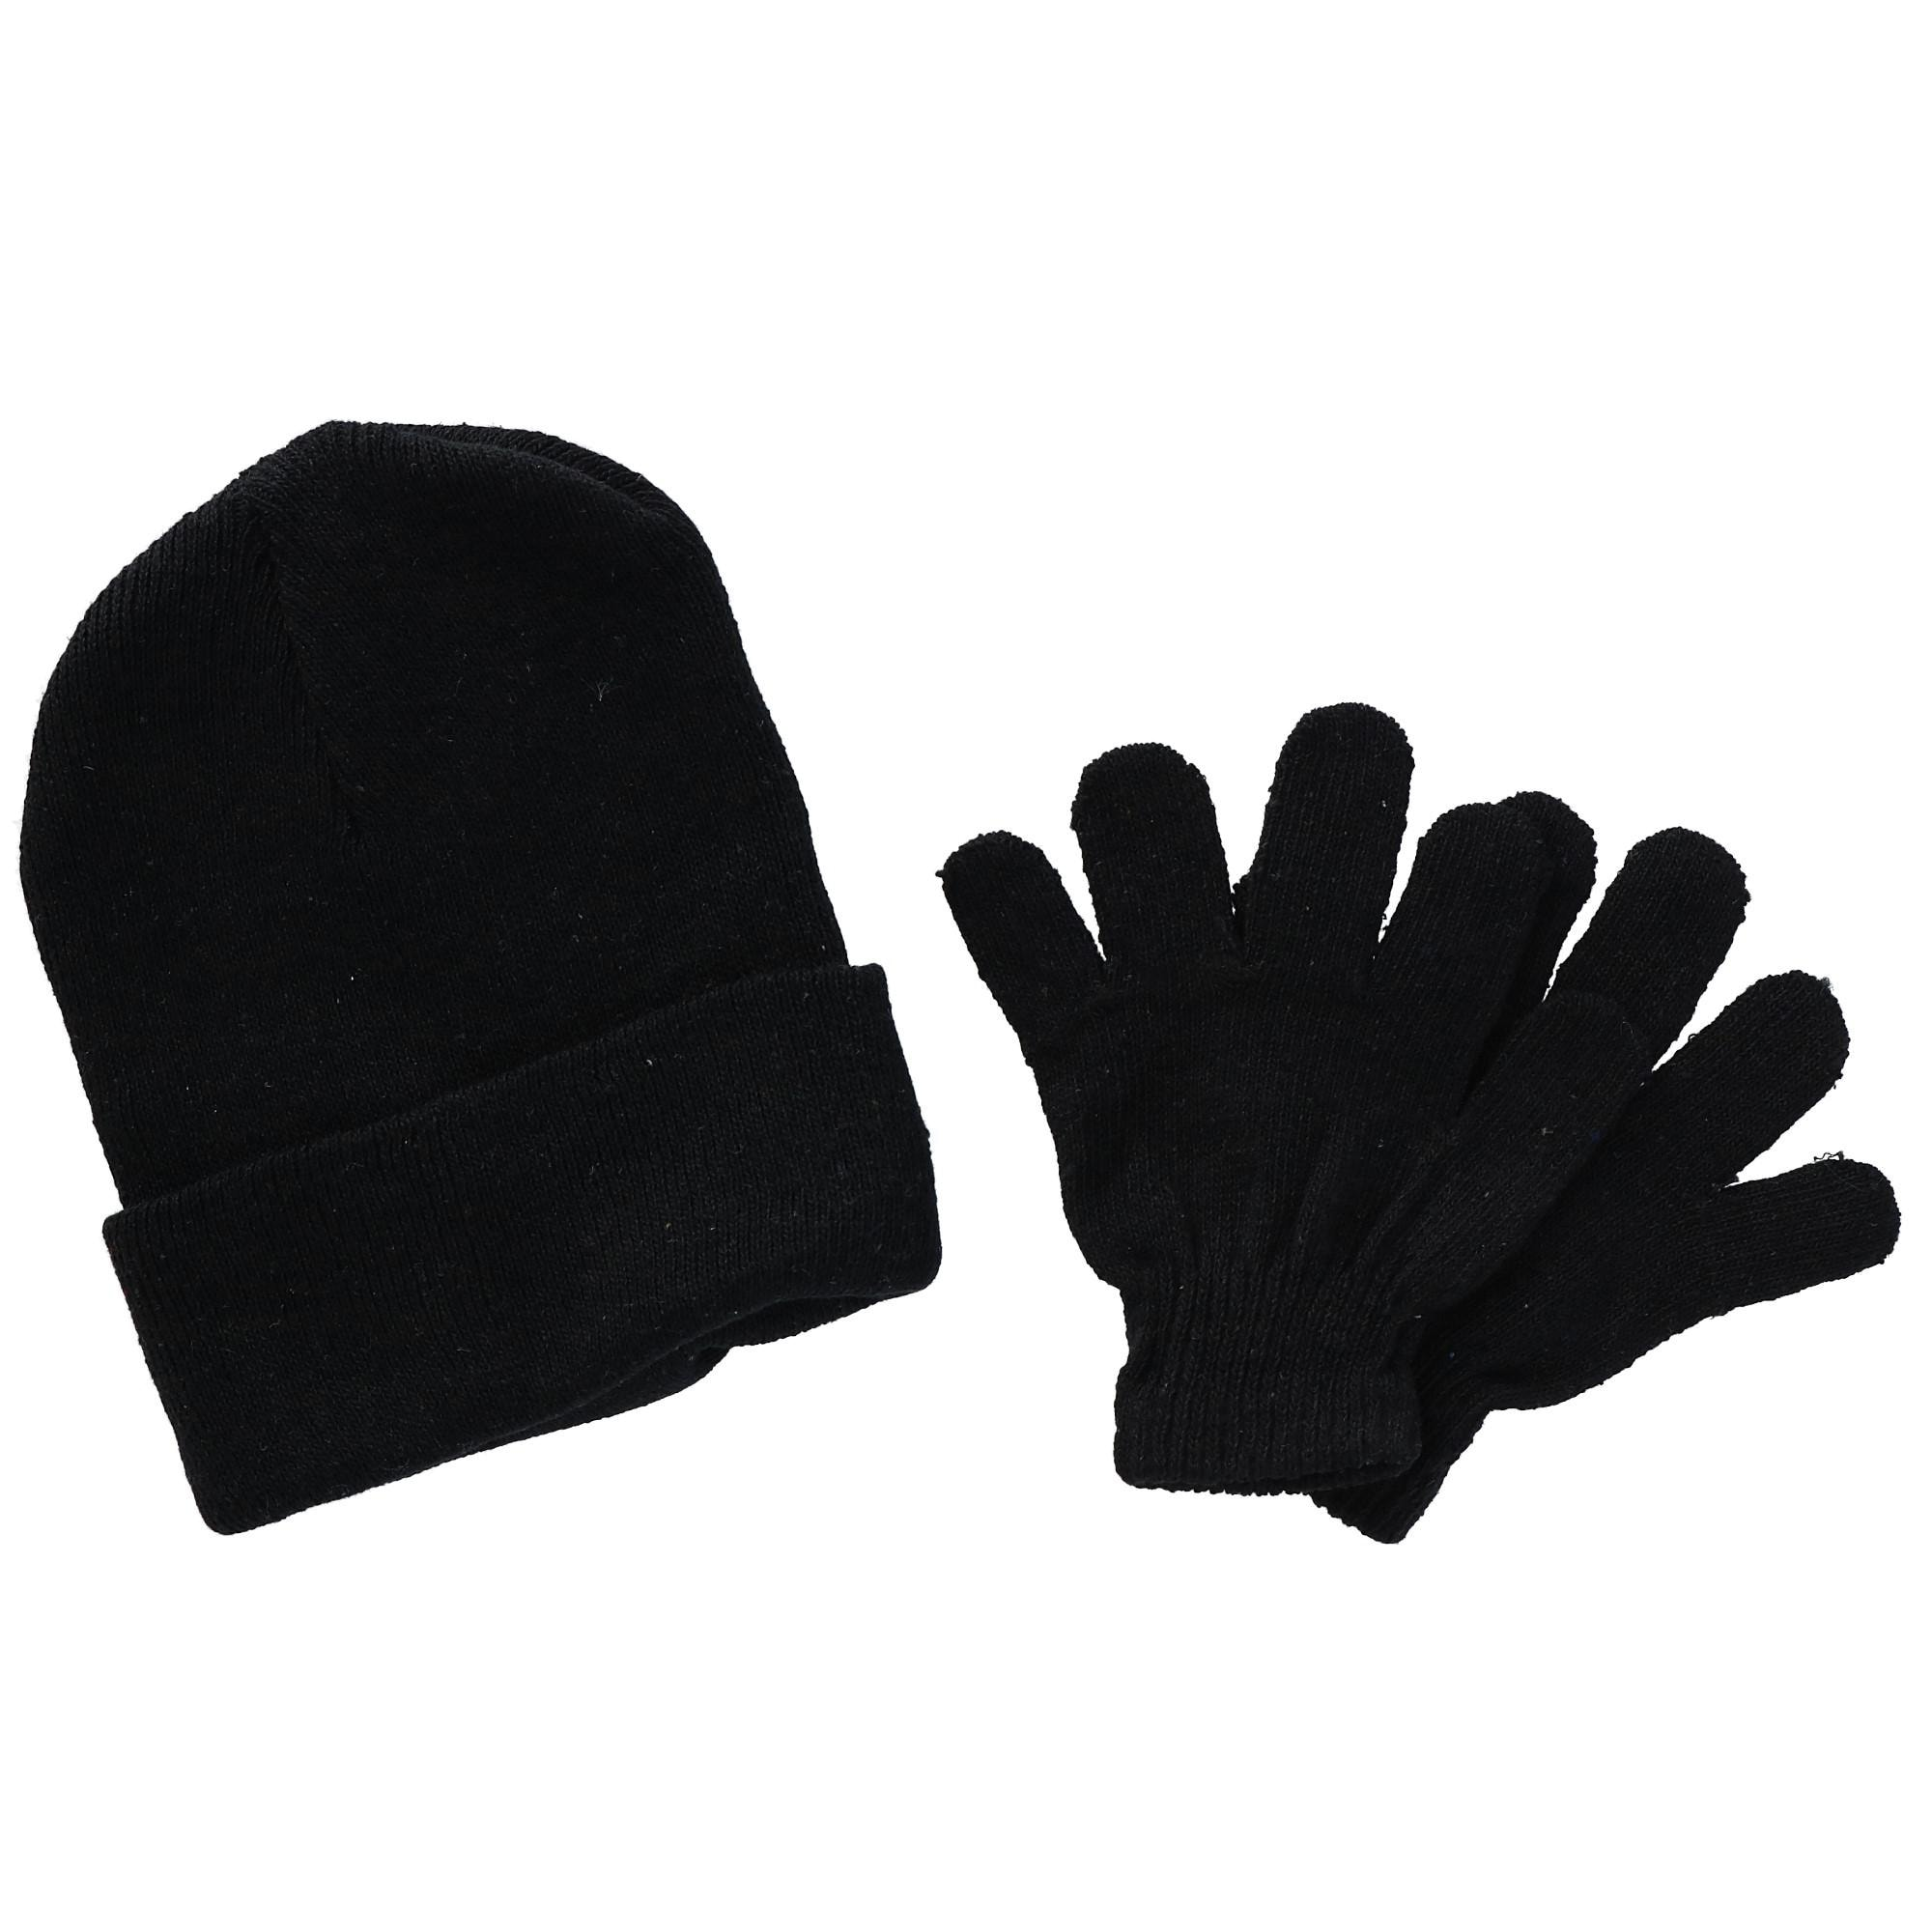 Black Polar Extreme Kids Basic Hat and Glove Set